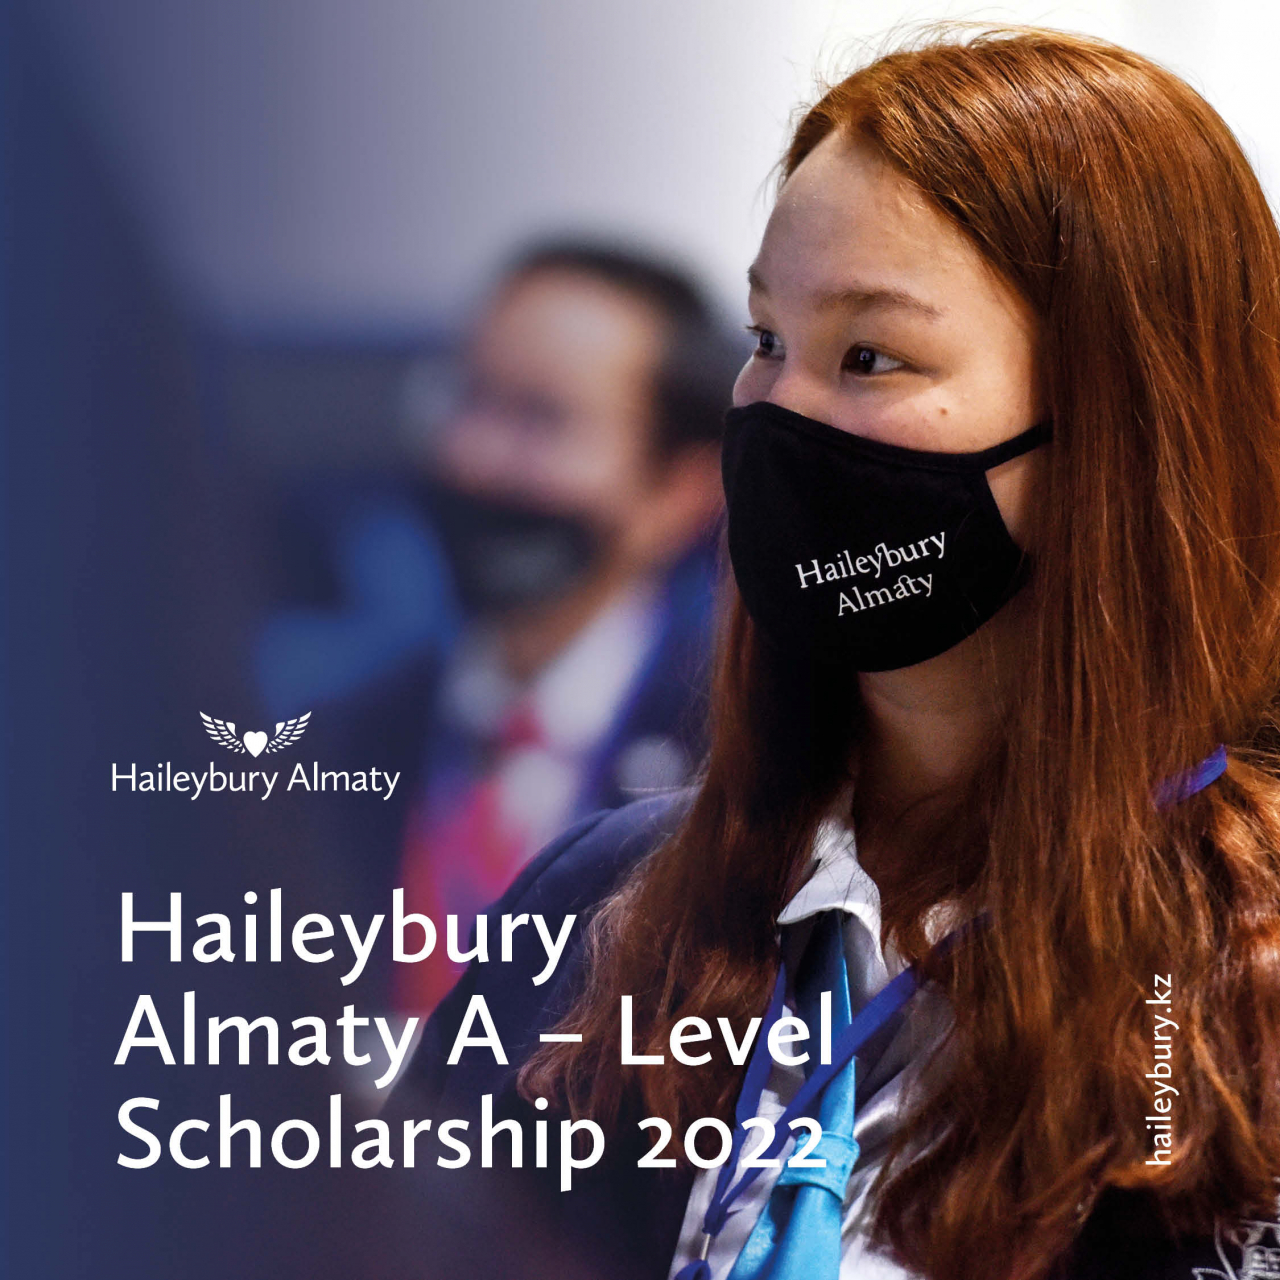 Haileybury Almaty A-Level Scholarship 2022